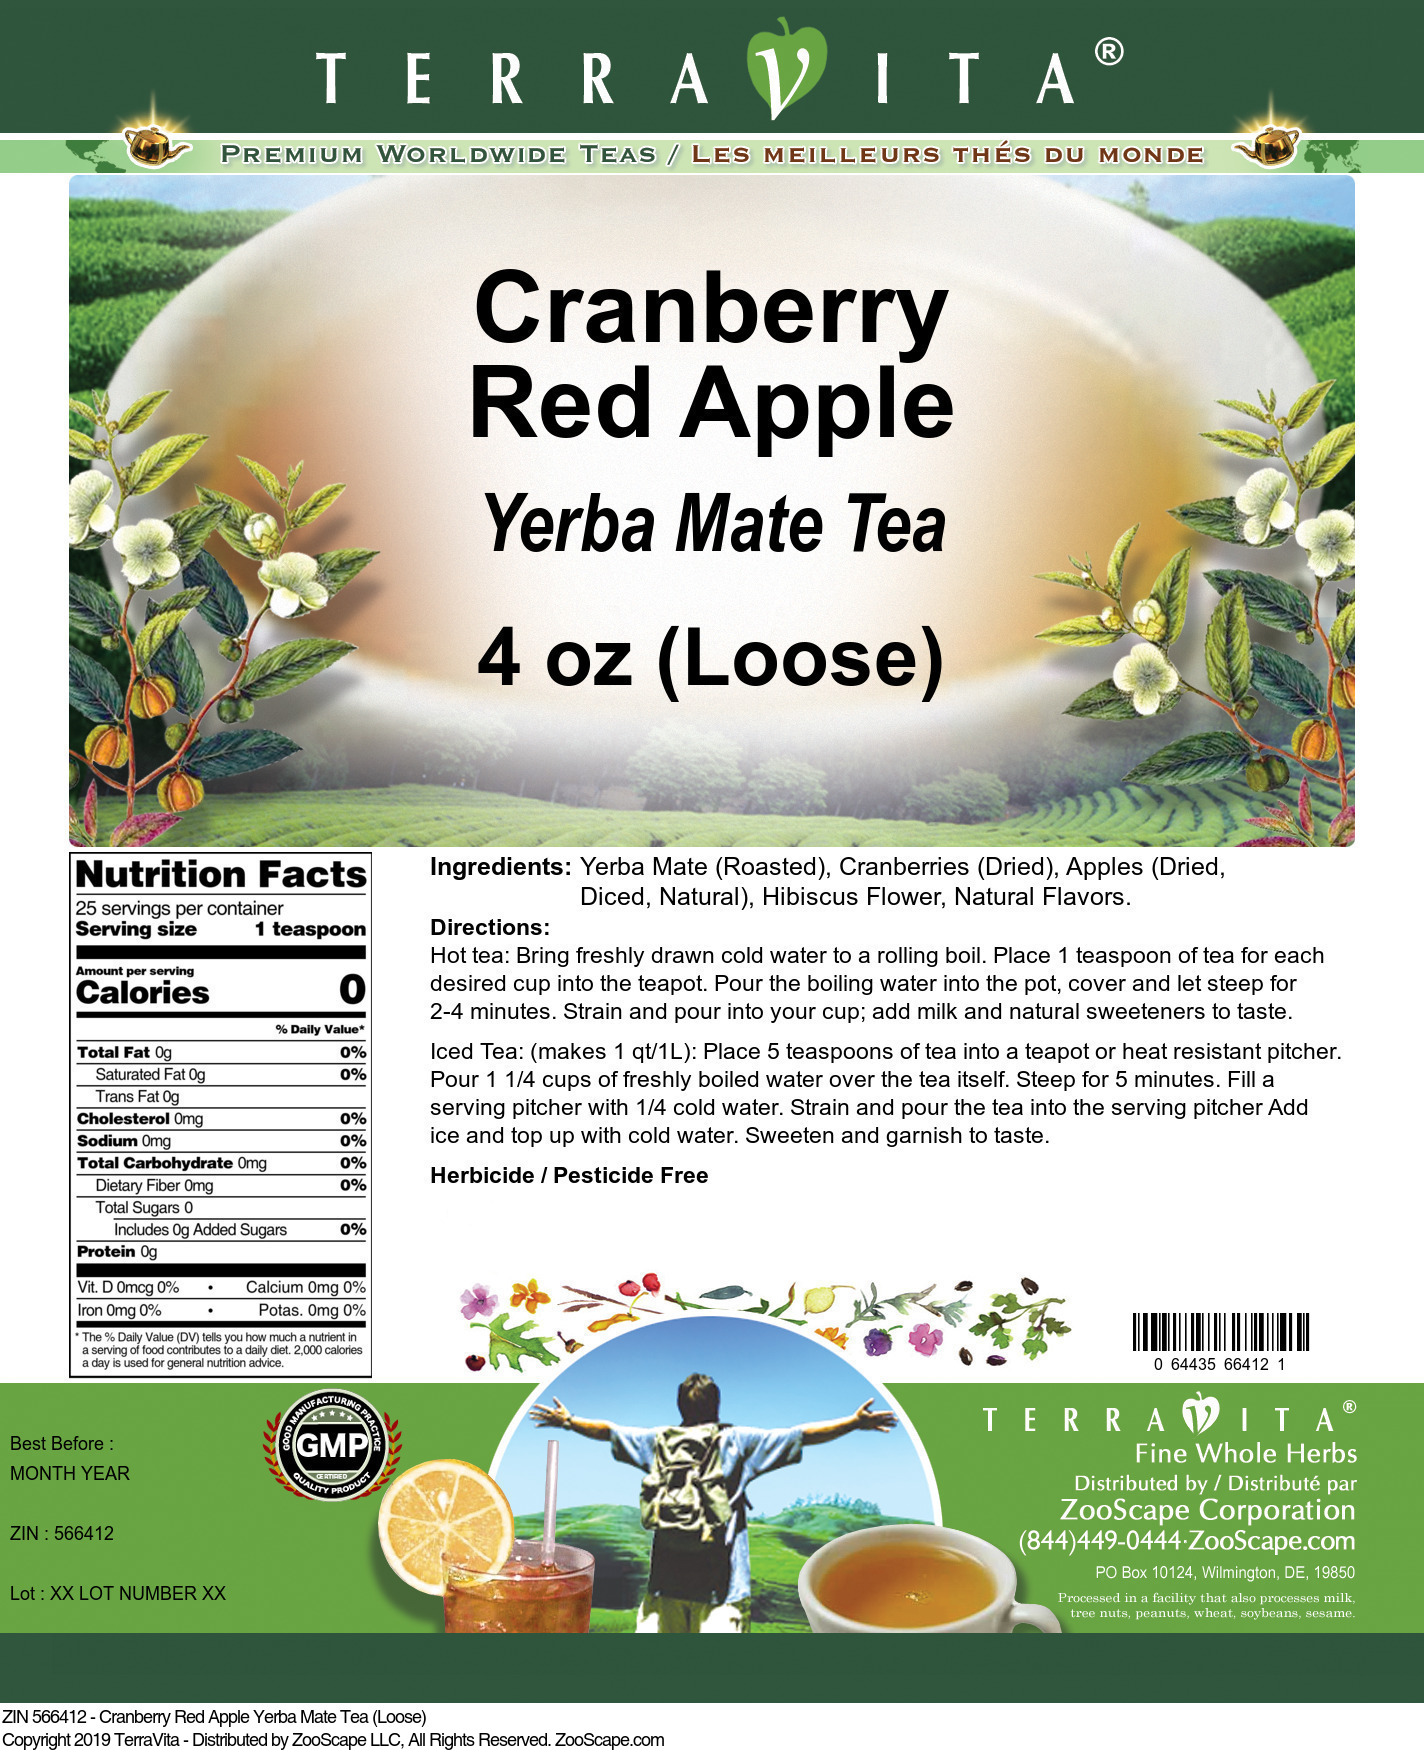 Cranberry Red Apple Yerba Mate Tea (Loose)